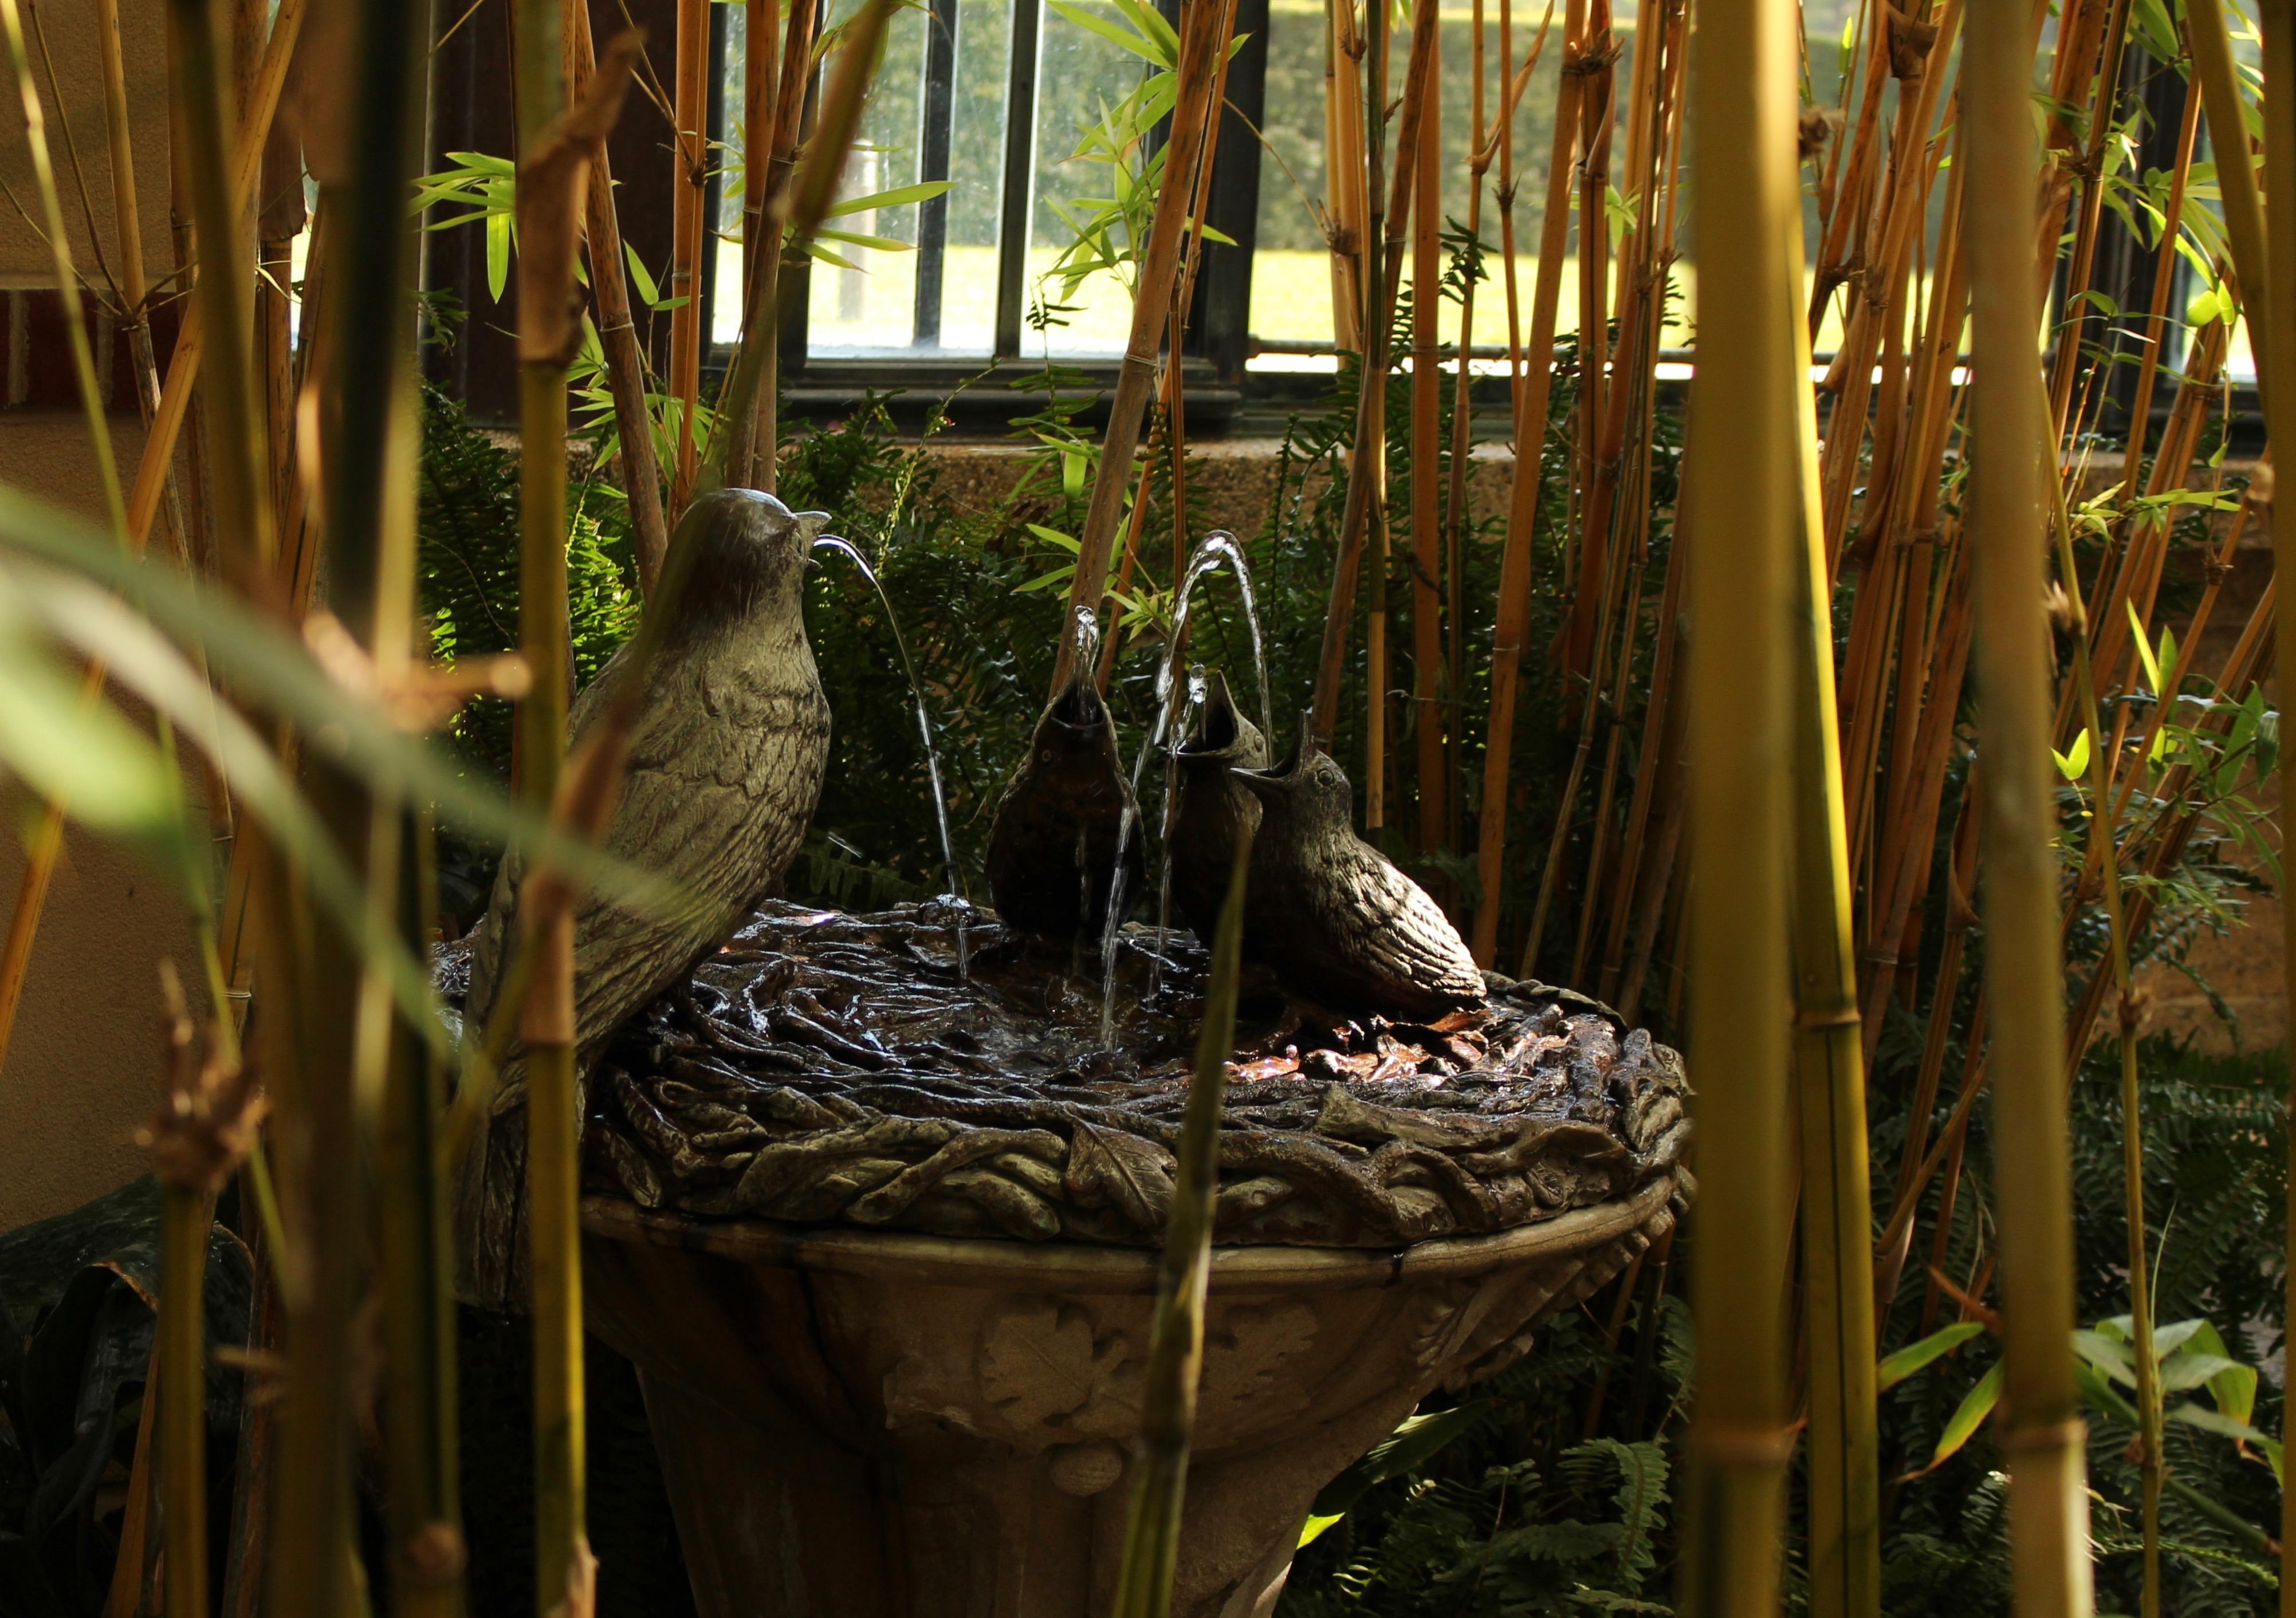 longwood gardens « sorta like suburbia